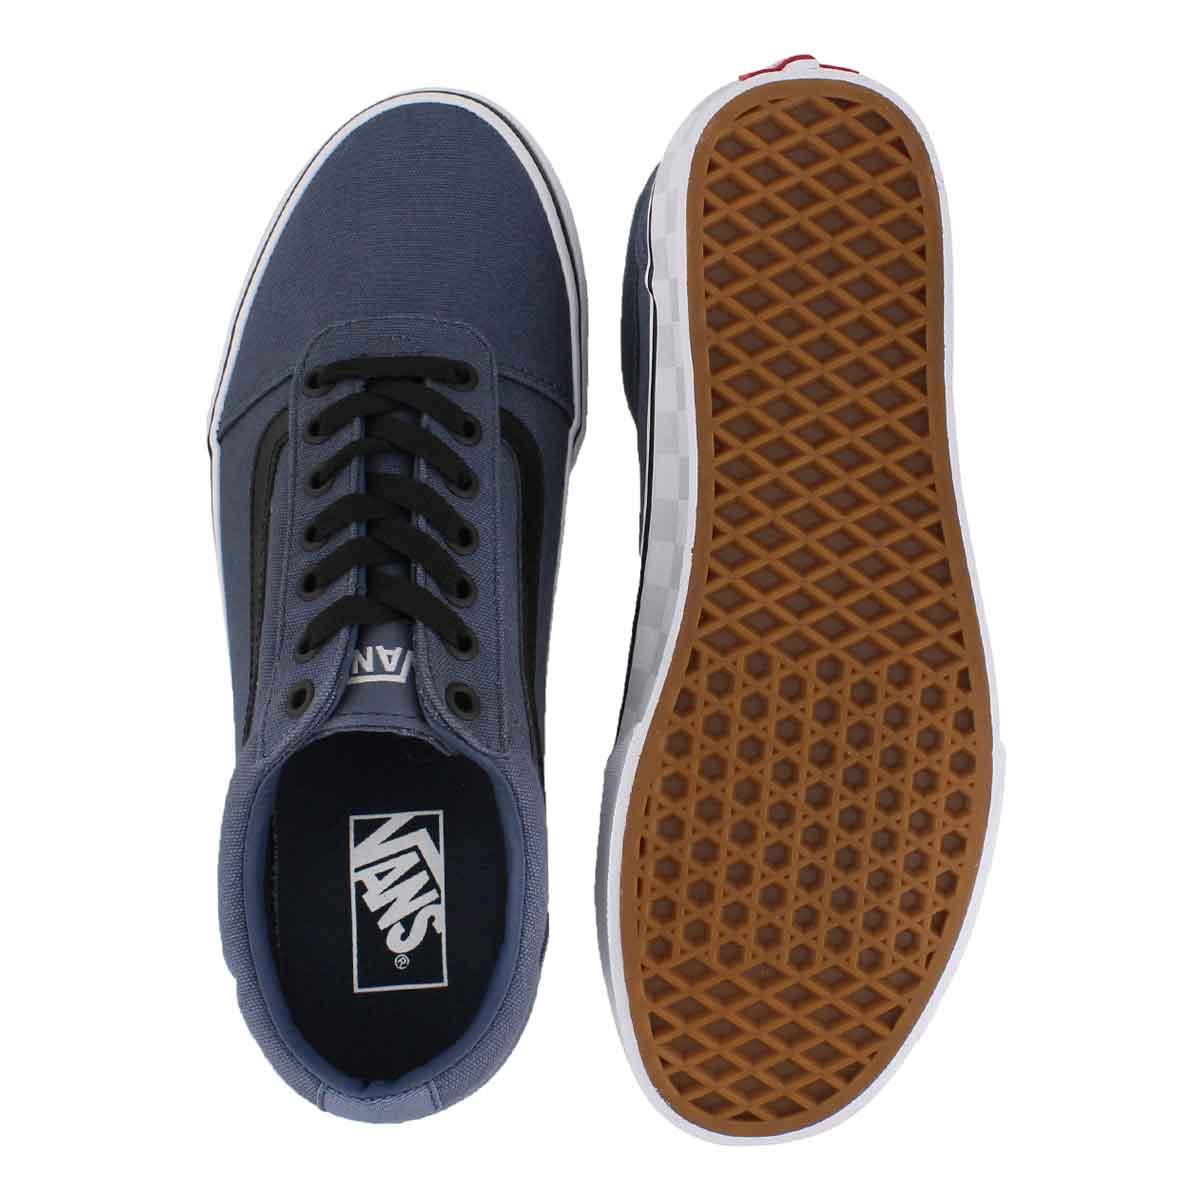 Mns Ward vntg indigo/wht lace up sneaker